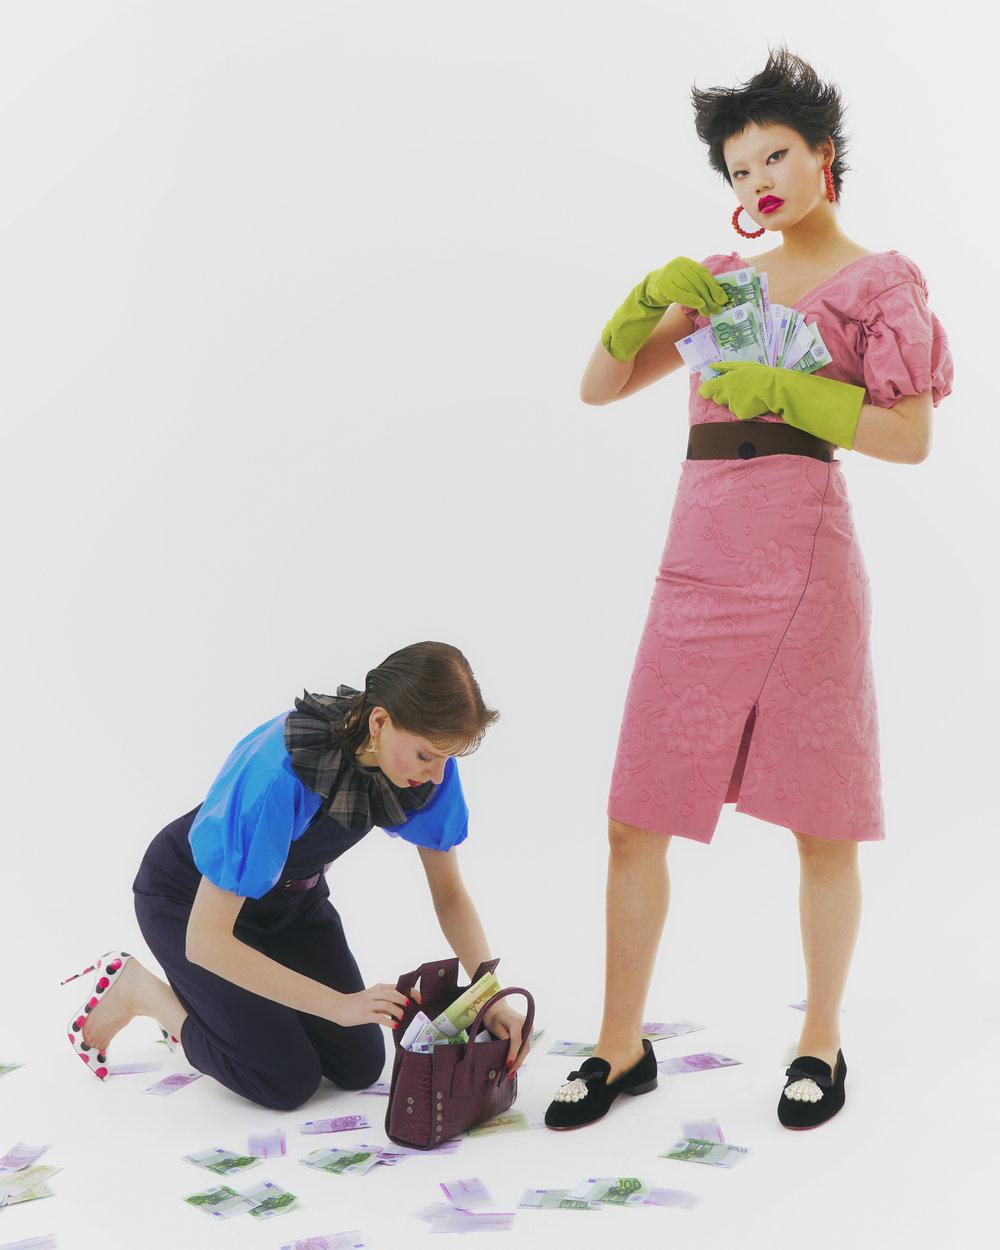 Izquierda: Camisa de  KENZO , collar de  CARVEN  por  GUILLAUME HENRY , cinturón de  LA CONTRIE , pantalón de A  CHEVAL PAMPA , mono de  ANTON BELINSKIY , zapatos de  CHRISTIAN LOUBOUTIN , bolso de  BALENCIAGA  y pendientes de  VIVIENNE WESTWOOD .  Derecha: Vestido de  VIVIENNE WESTWOOD , cinturón de  MAXMARA , zapatos de  CHRISTIAN LOUBOUTIN , pendientes de  BALABOOSTÉ , guantes de  AGNELLE